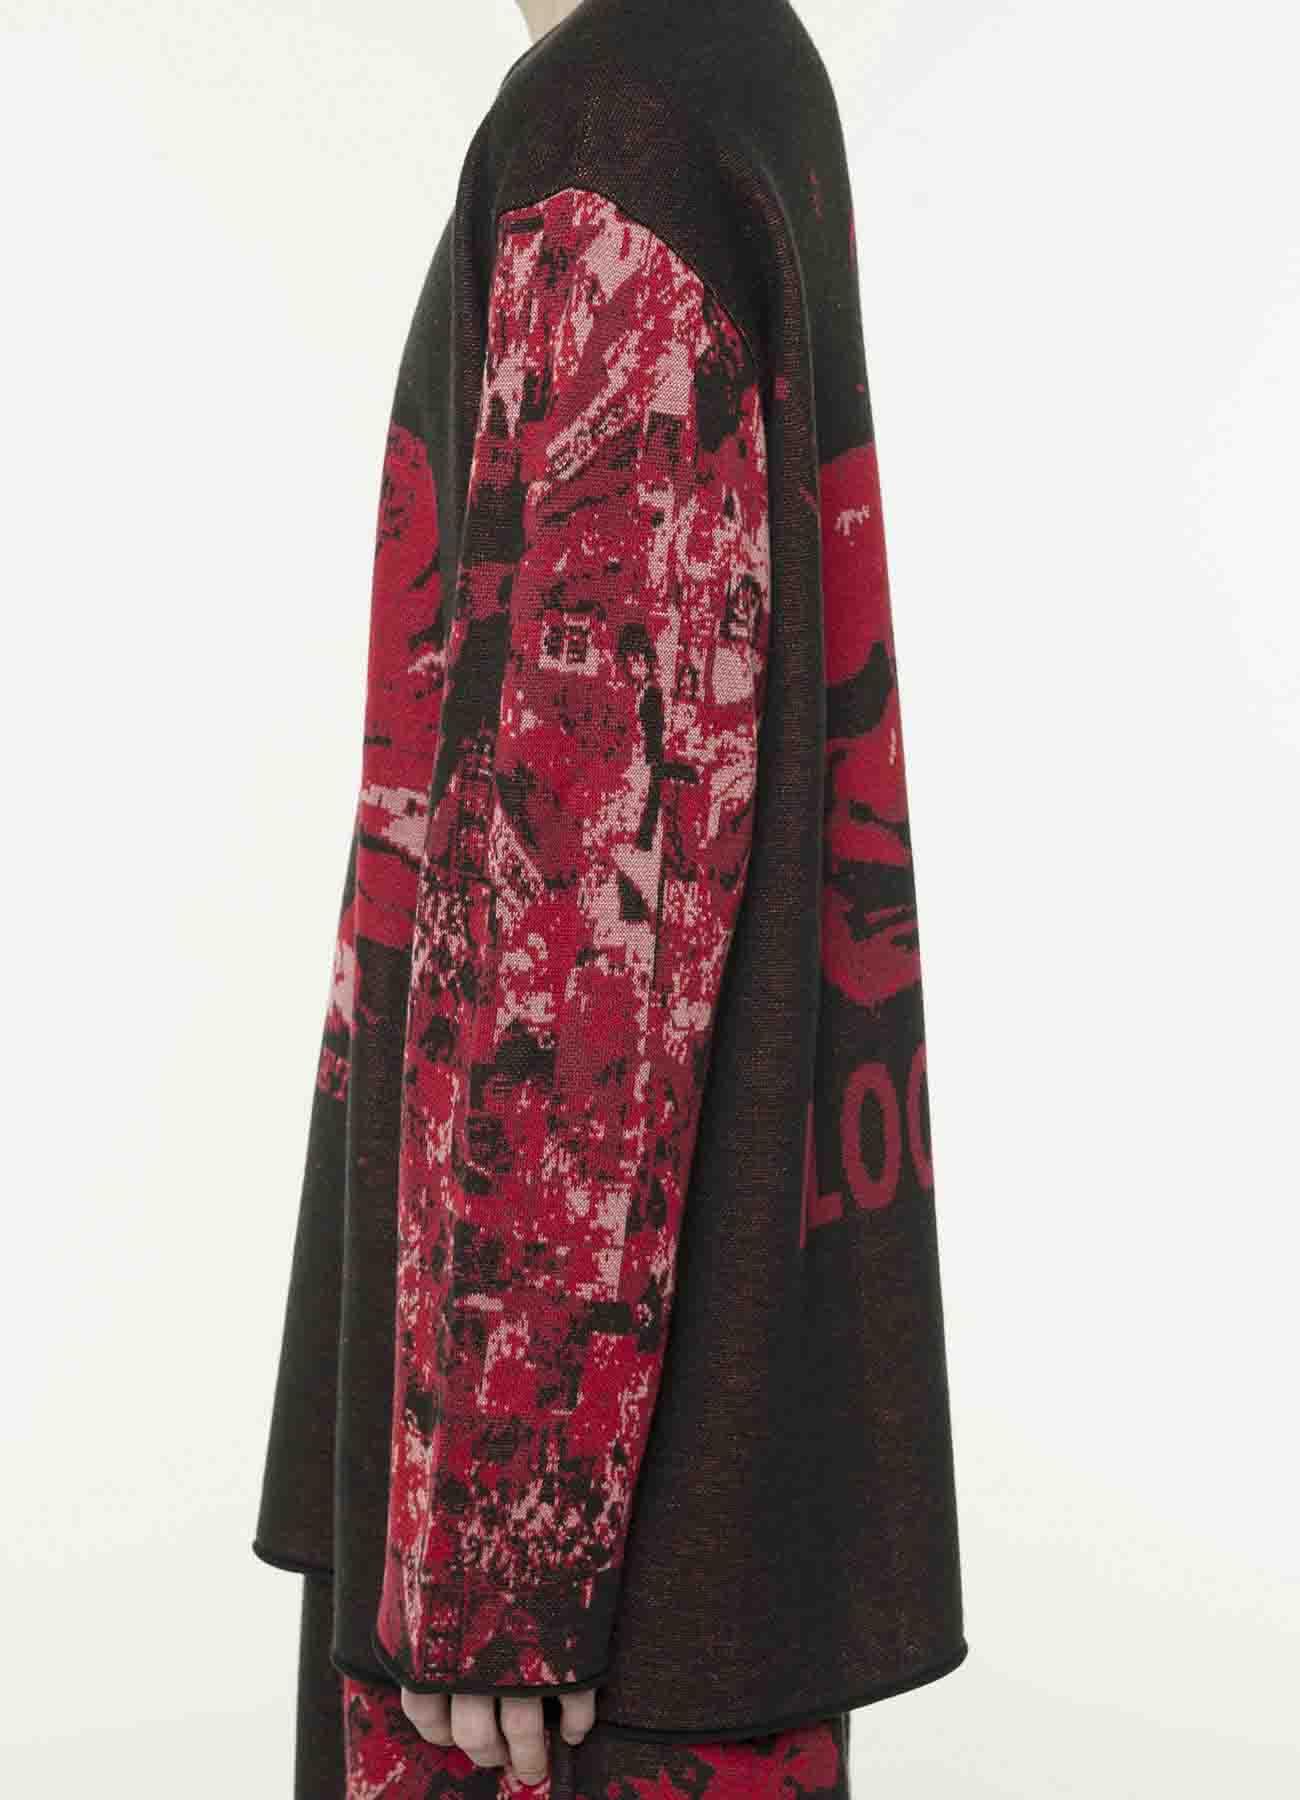 Red Shock系列-提花针织衫-红/黑